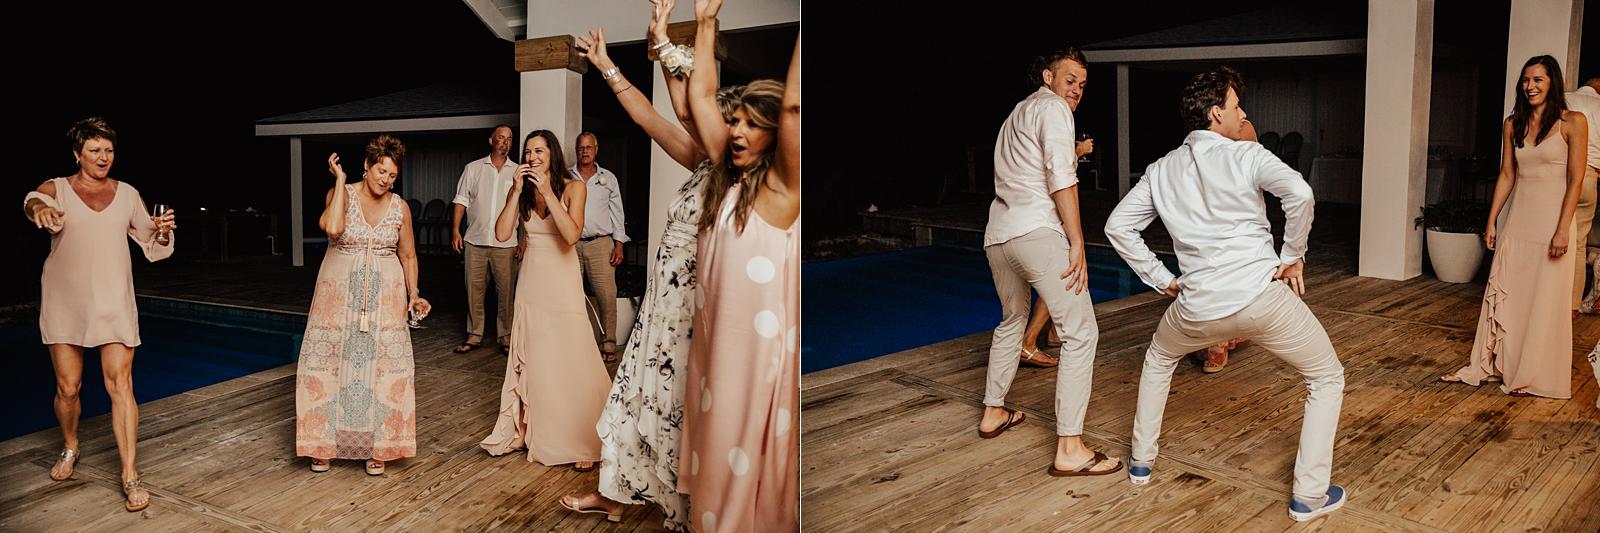 Jenni & Andrew Intimate Beach Destination Wedding in Little Exuma, Bahamas_0545.jpg